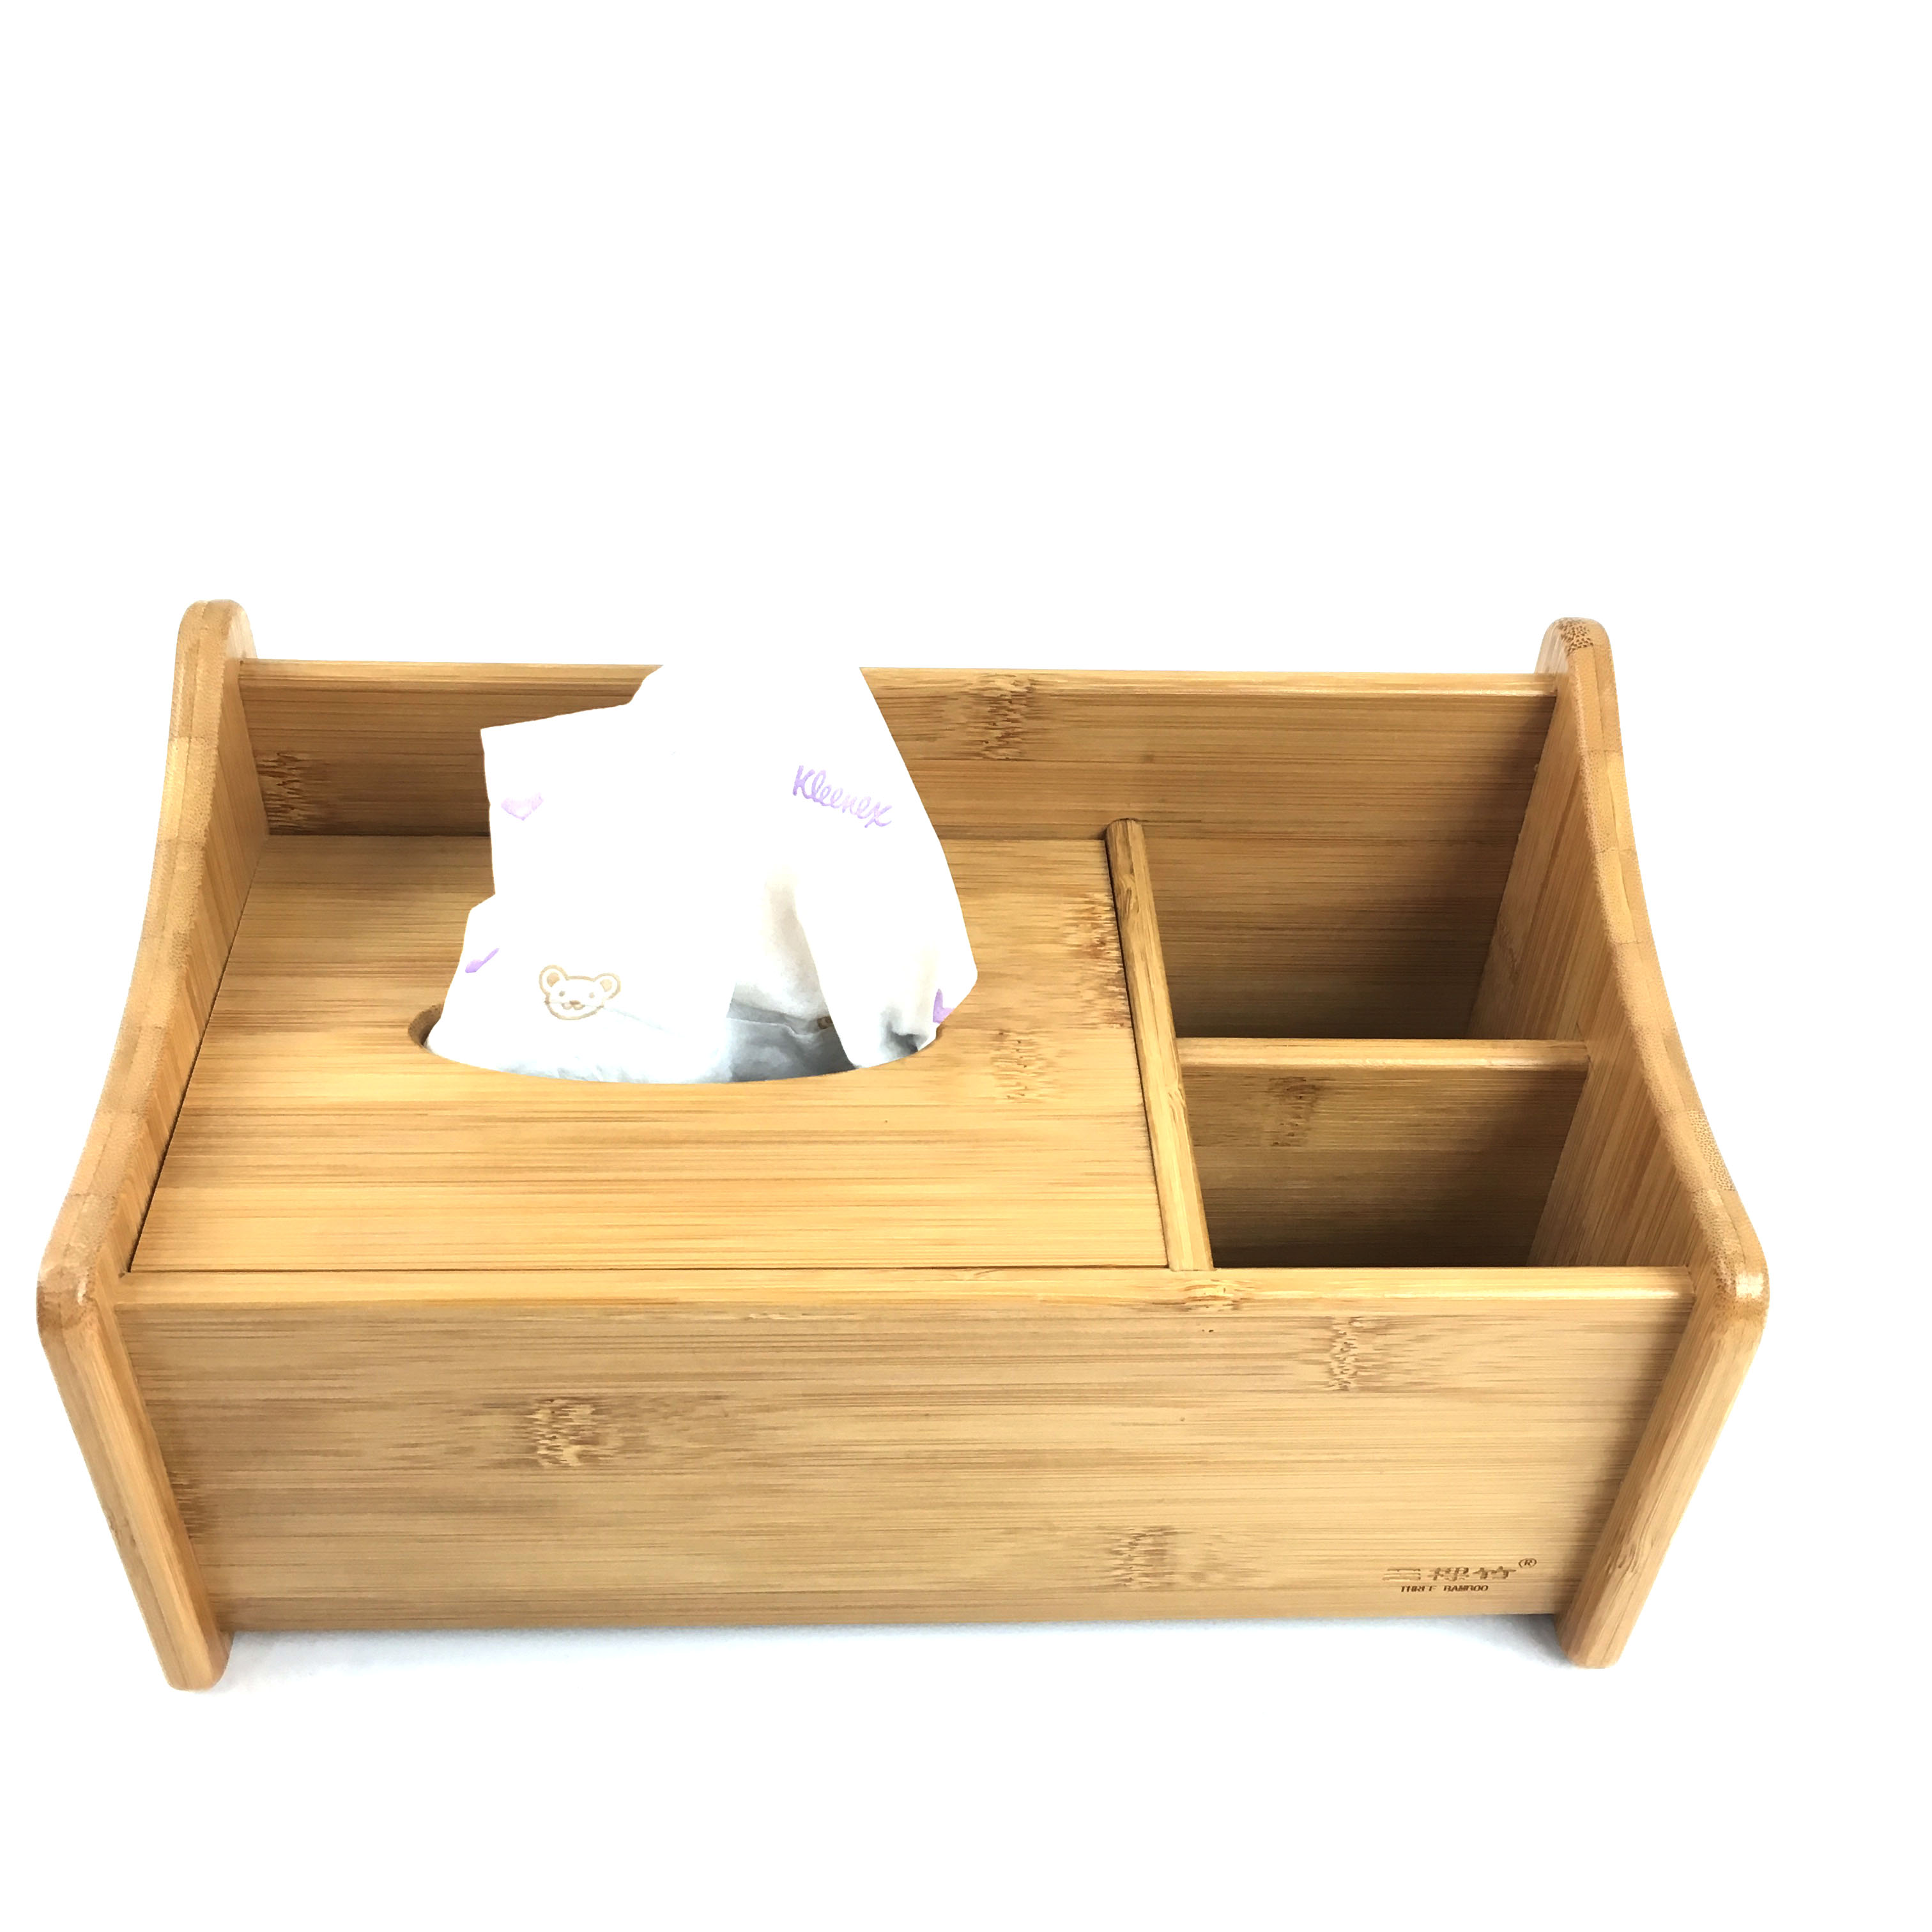 Multifunction Bamboo Tissue Box Desk Organizer From Homex